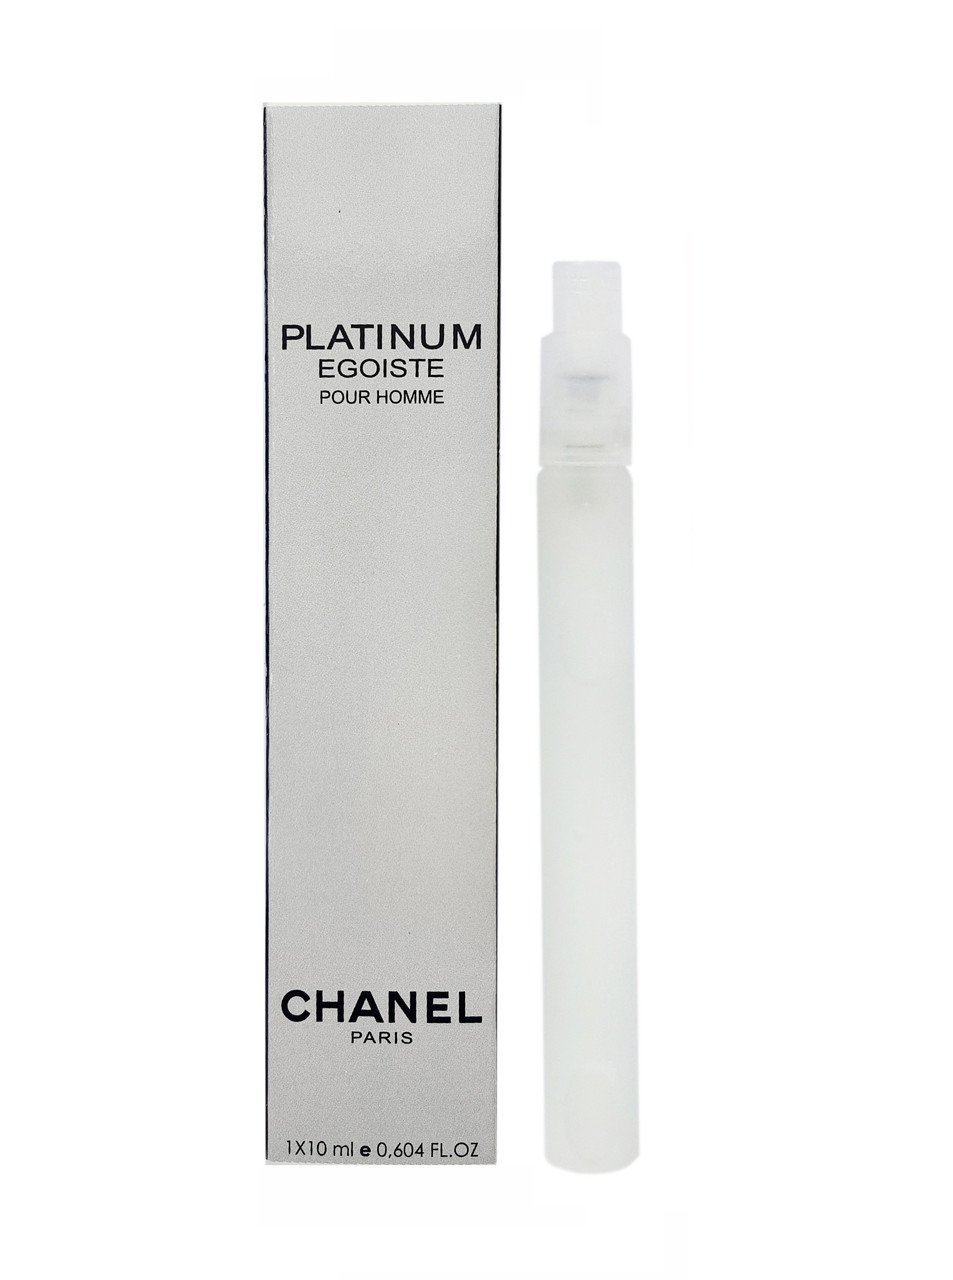 "Мини парфюм Chanel Egoiste Platinum (Шанель Эгоист Платинум) 10 мл - ""ЛюксРяд"" - парфюмерия и косметика премиум качества в Киеве"